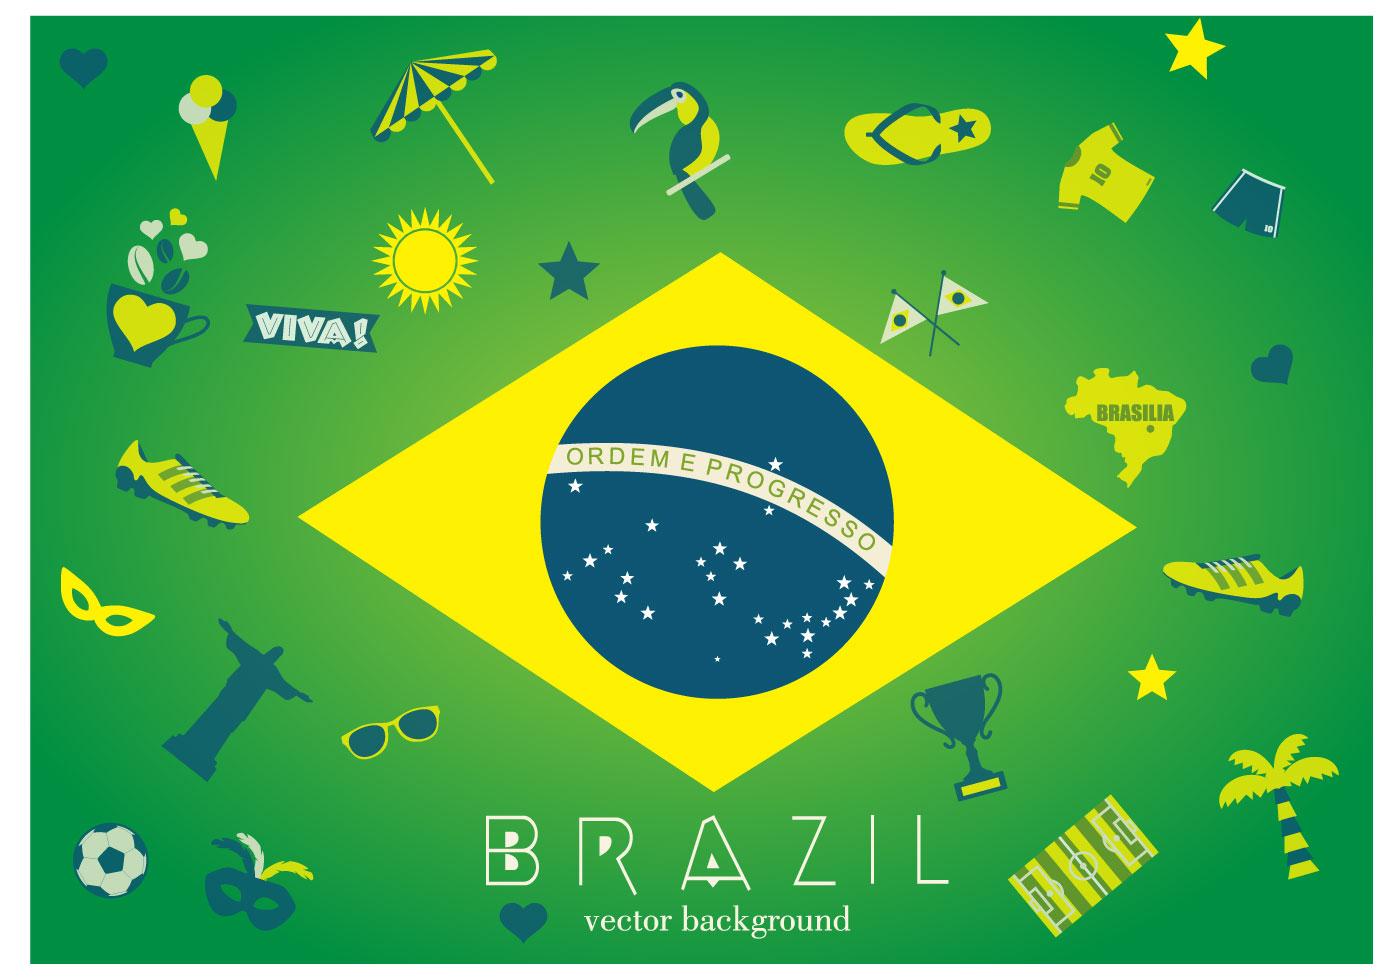 Free online dating brazil